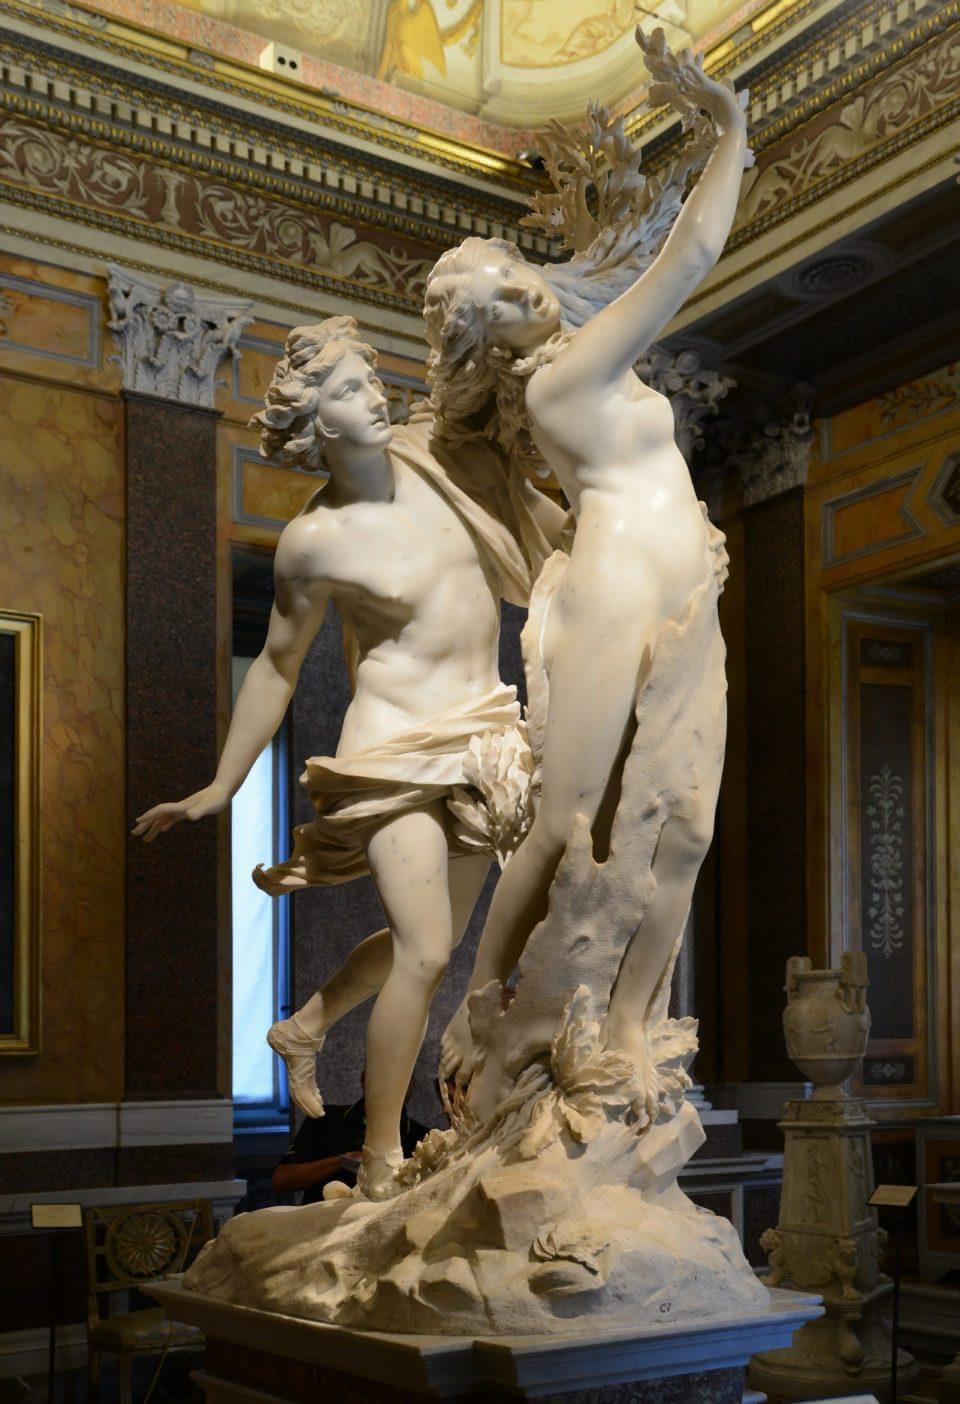 G. F. Handel (1685-1759): As Cantatas Italianas, Vol. VII – Apollo e Dafne (HWV 122), Agrippina condotta a morire (HWV 110), Cuopre talvolta il cielo (HWV 98)